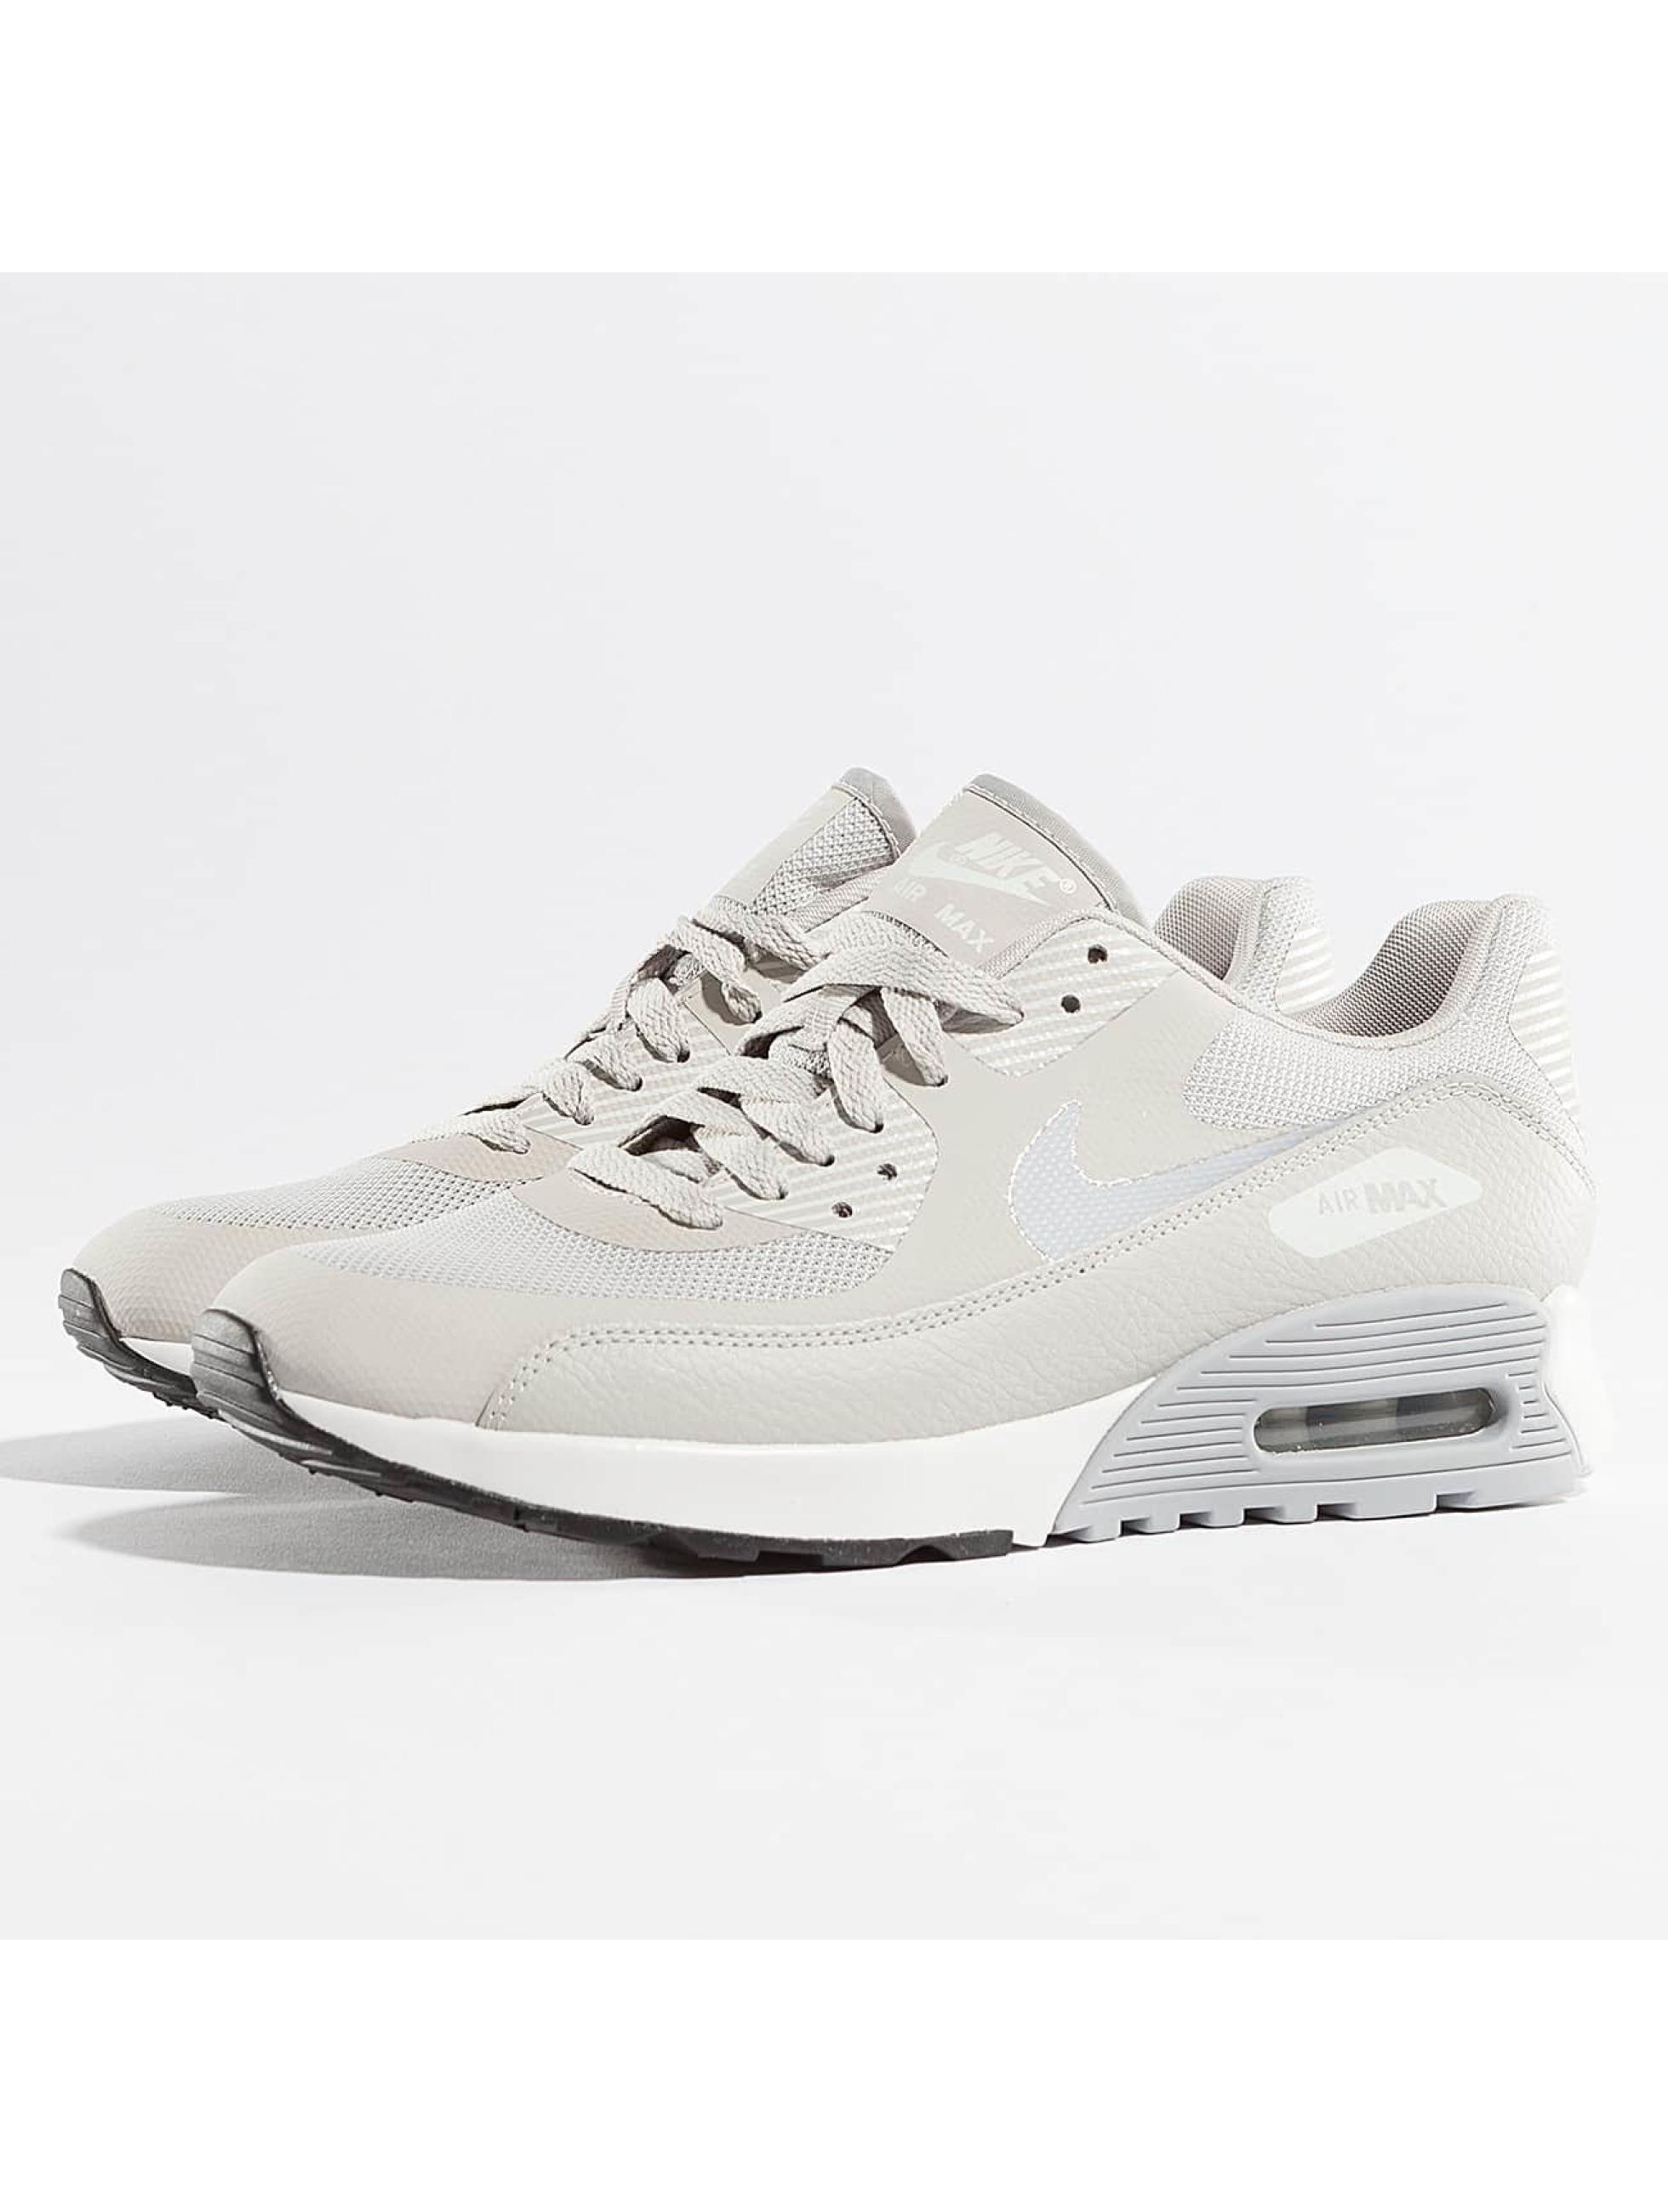 Nike Frauen Sneaker W Air Max 90 Ultra 2.0 in grau